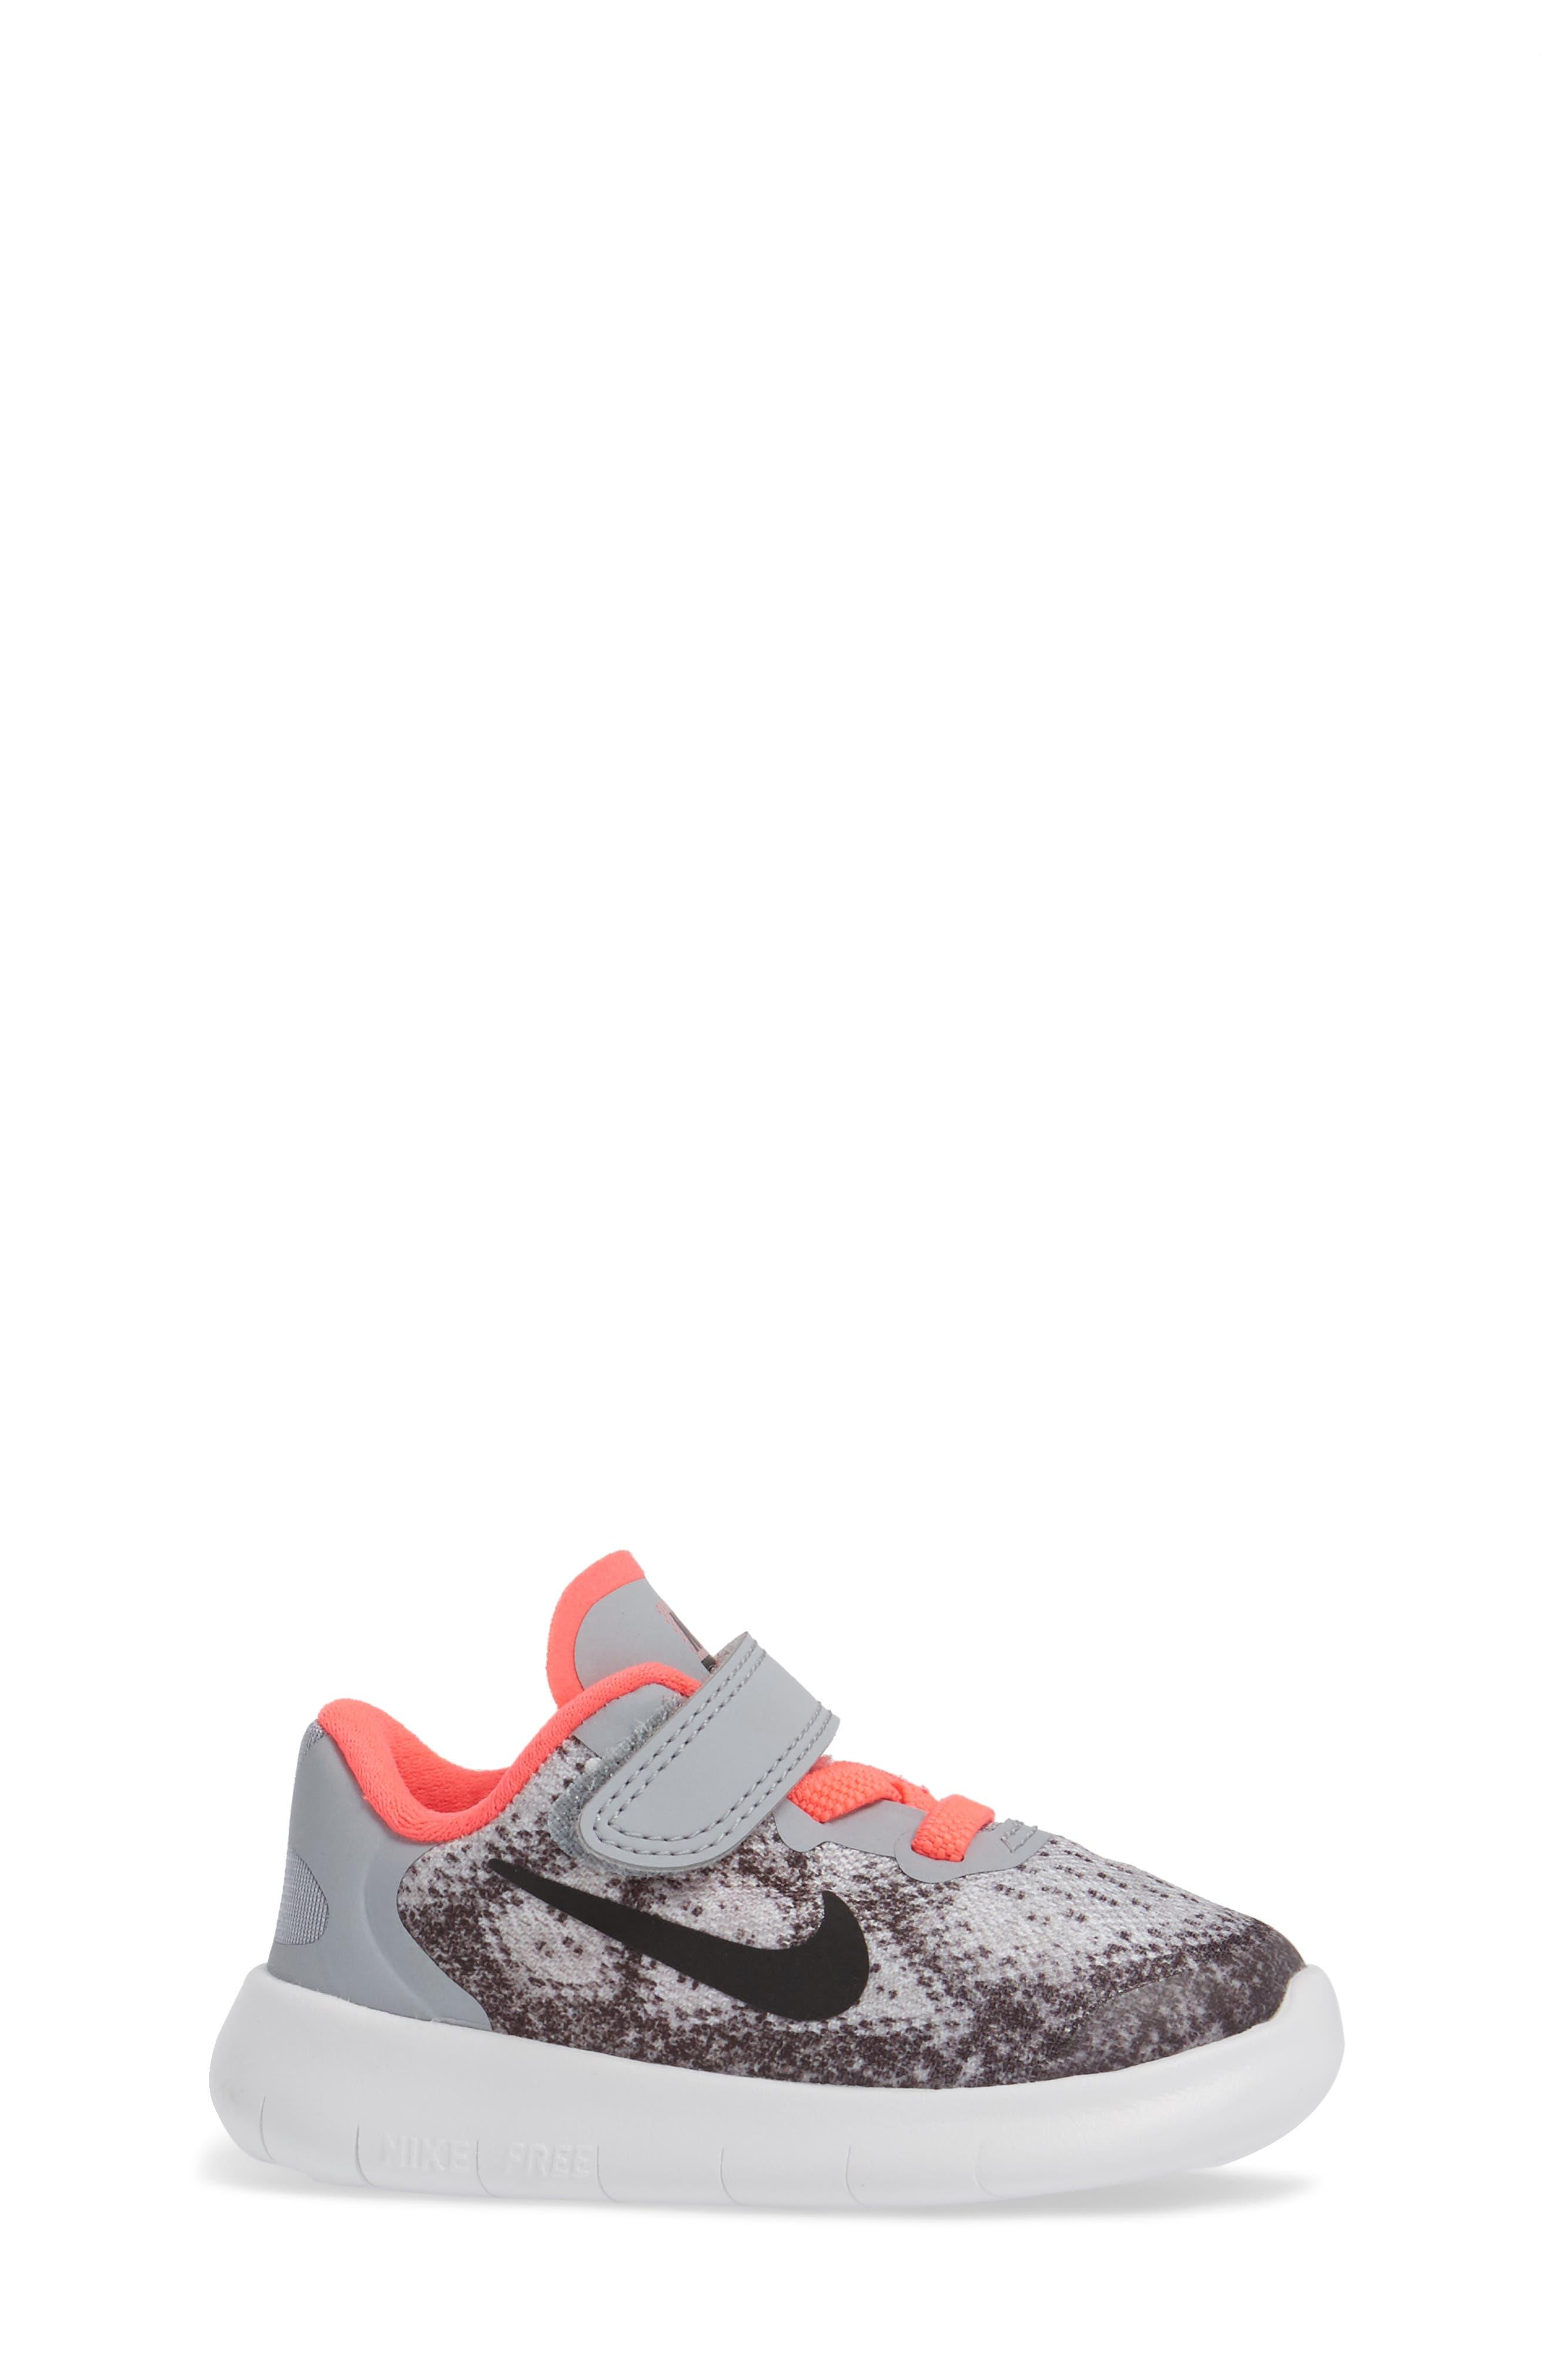 Free Run 2017 Sneaker,                             Alternate thumbnail 3, color,                             020